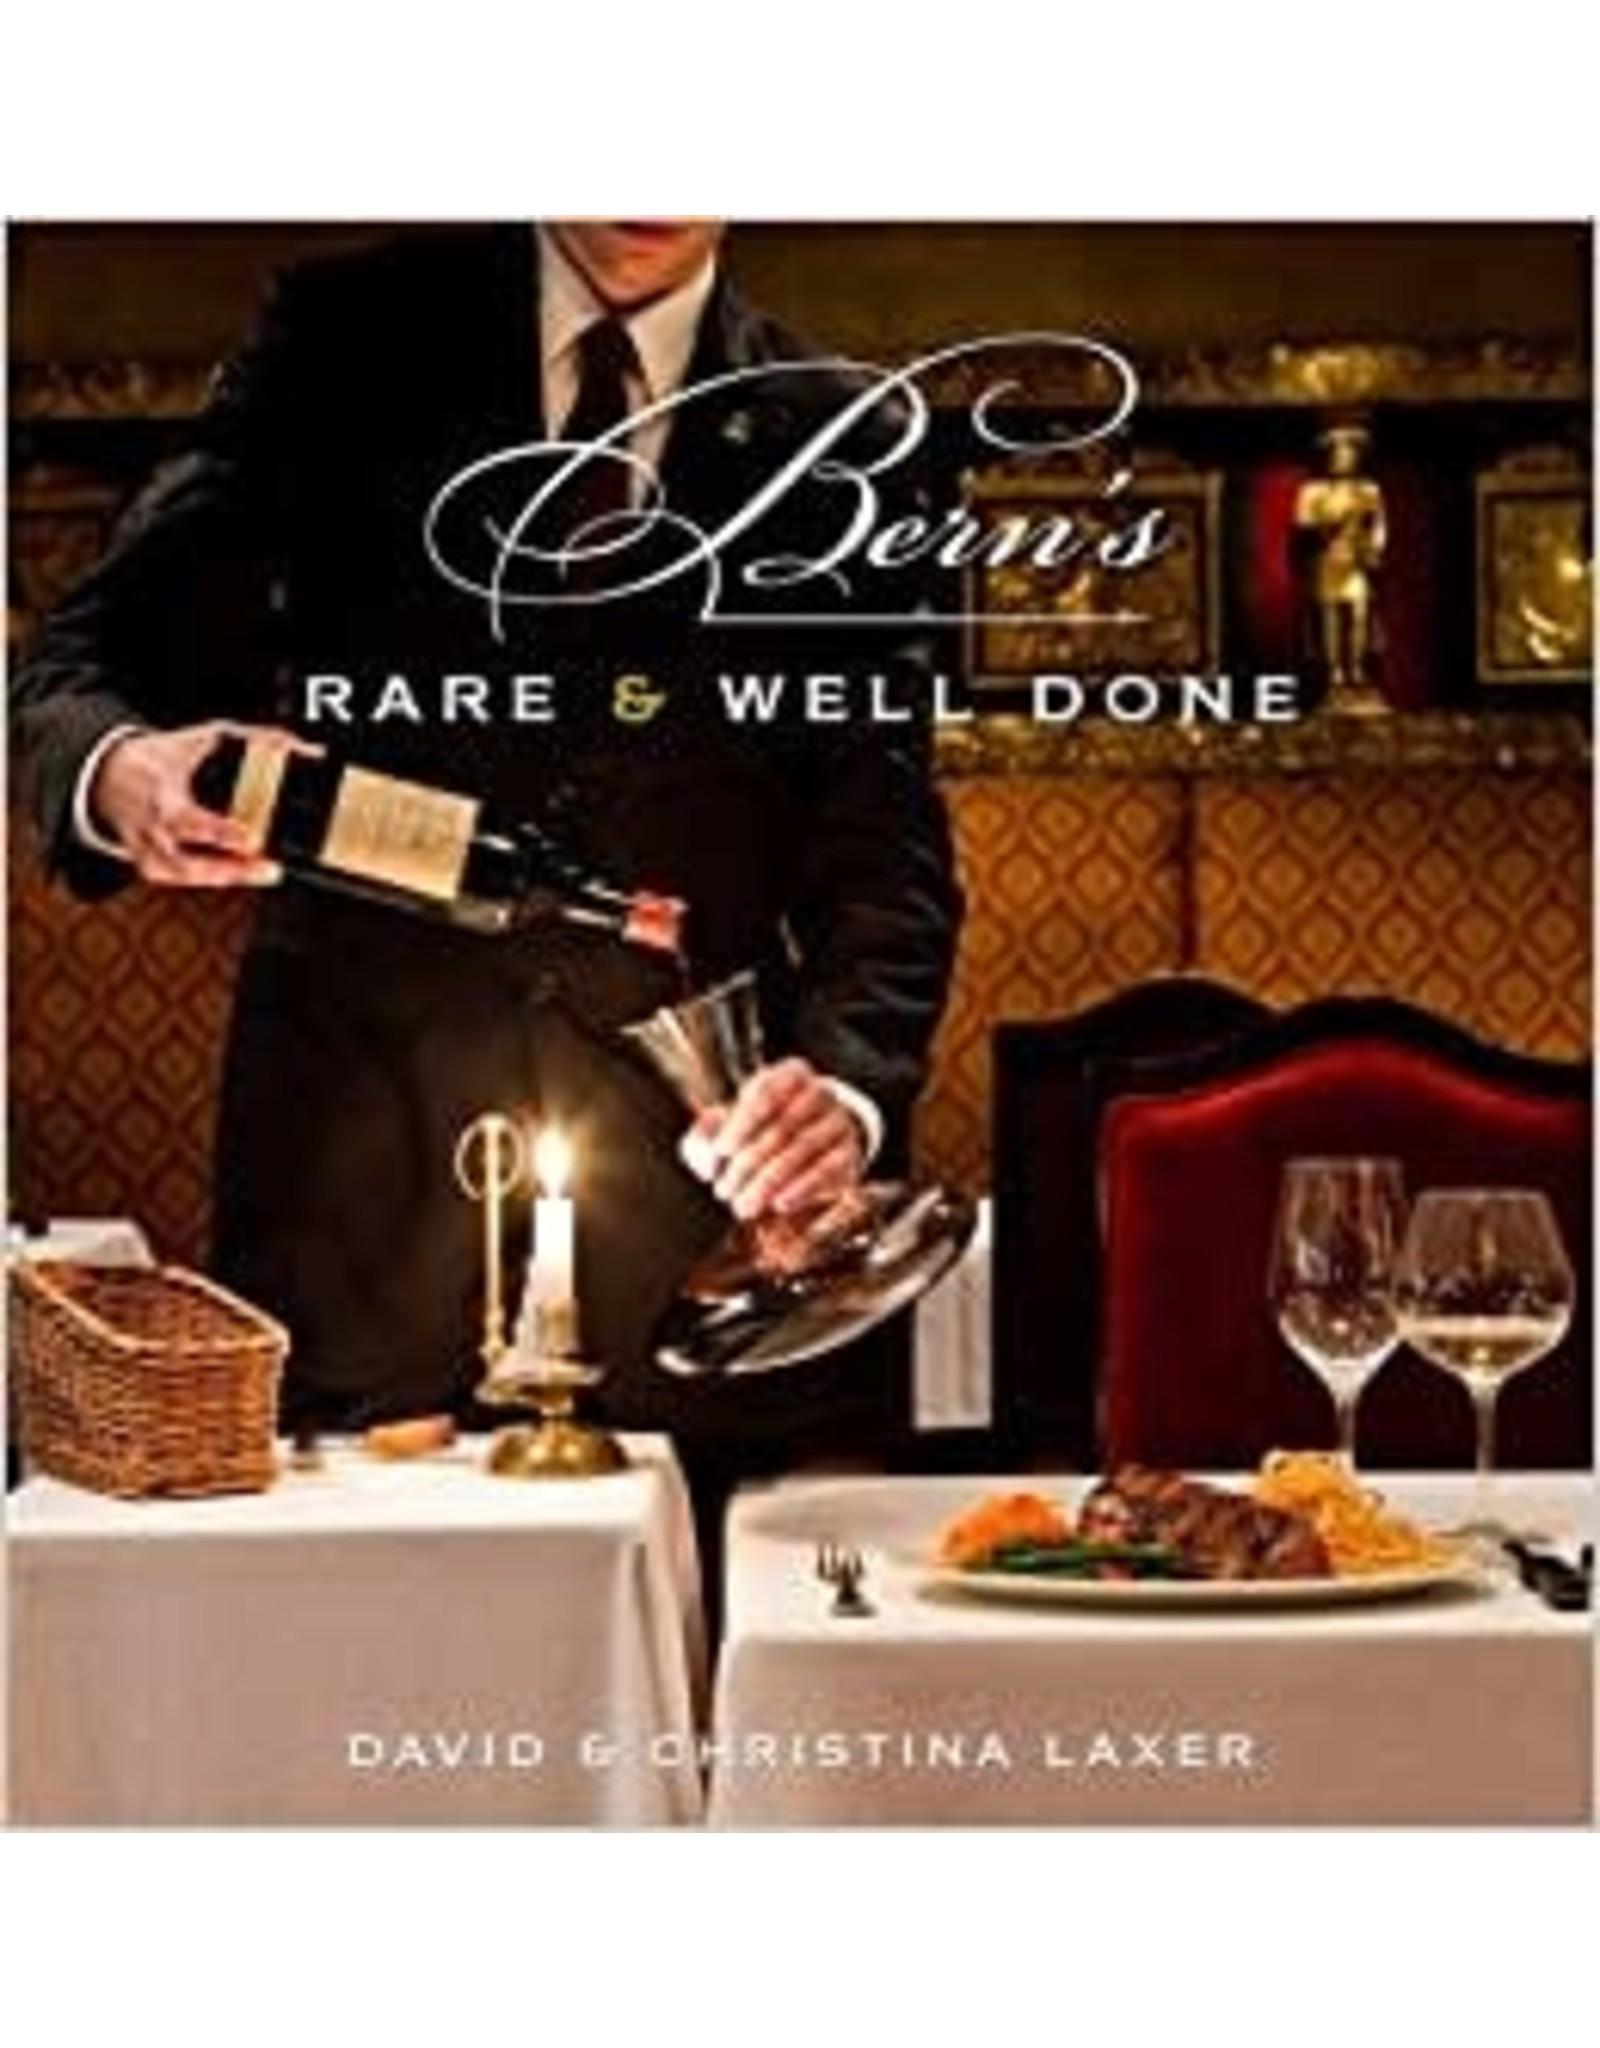 Bern's Steak House Rare and Well Done book